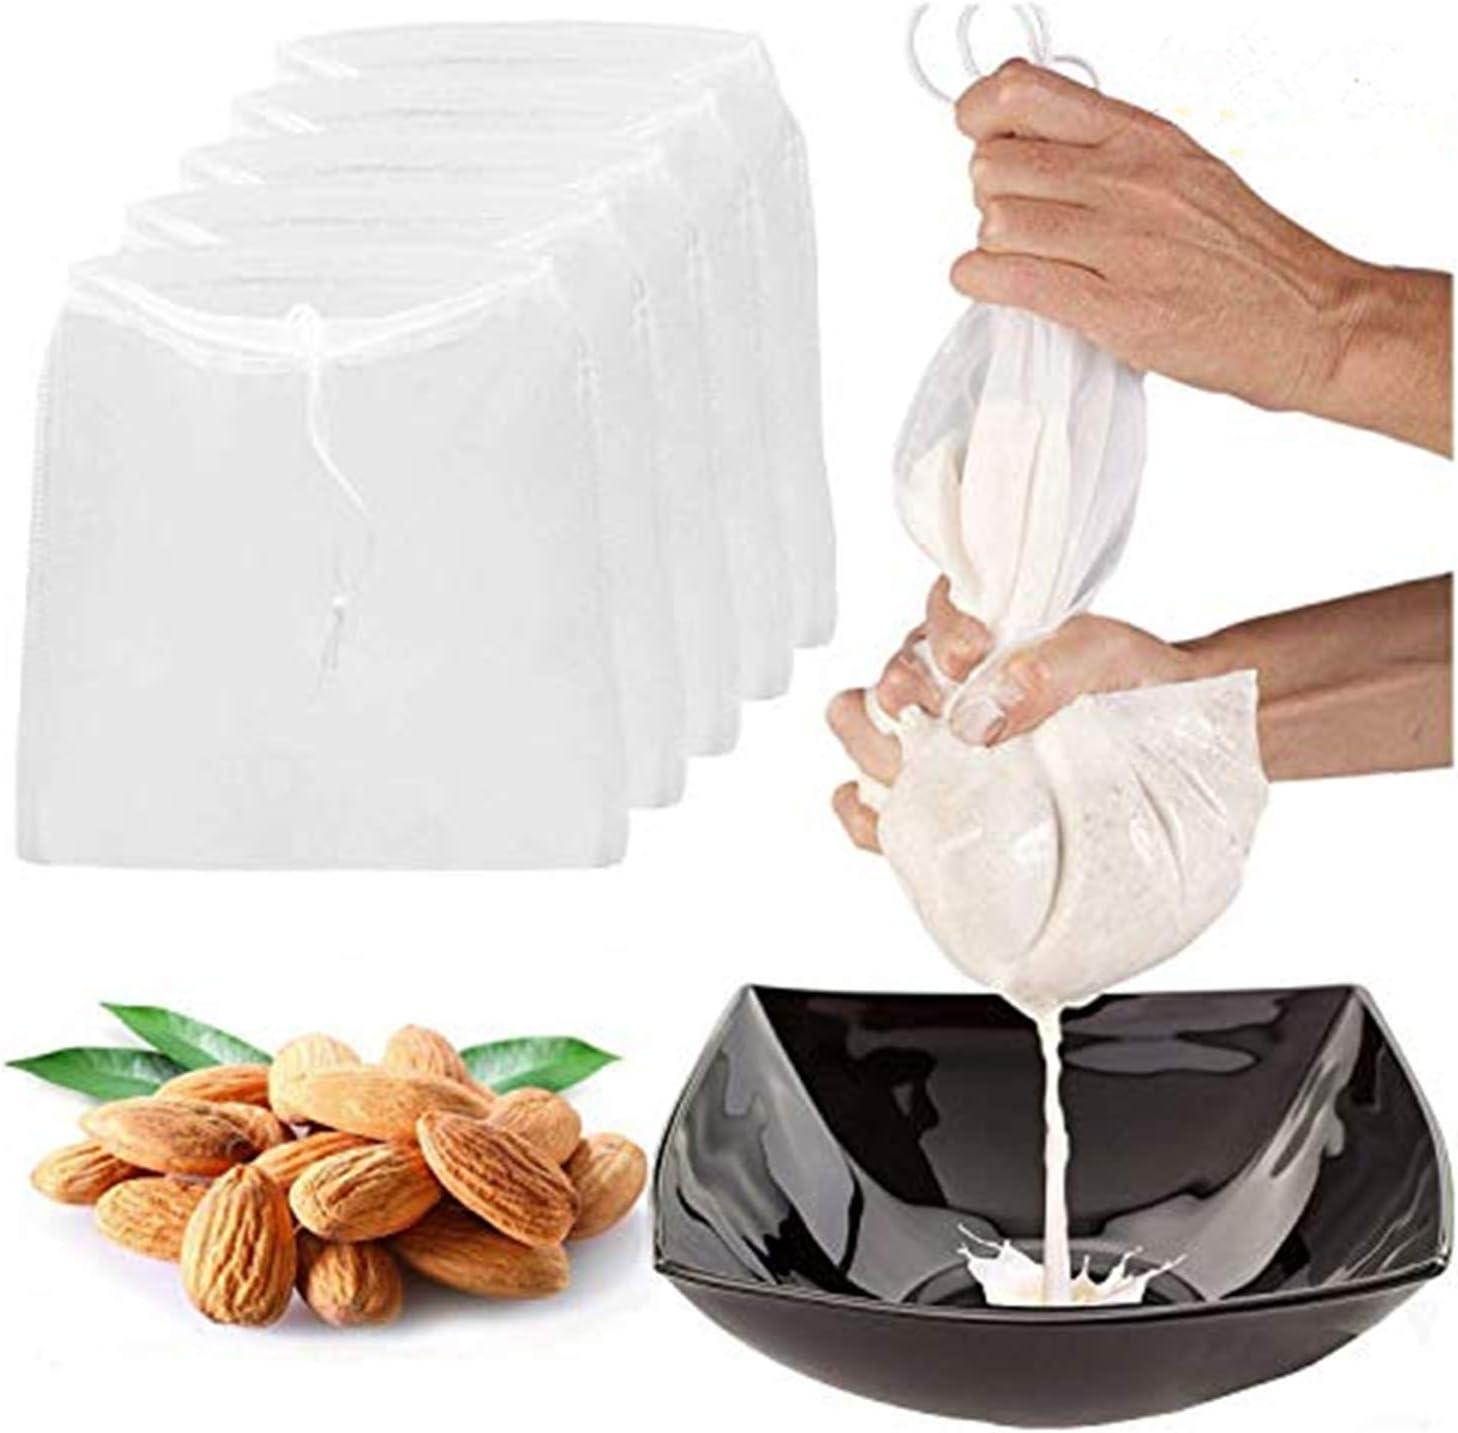 "5 Pcs Pro Quality Nut Milk Bag, LERORO 10"" x 12"" Reusable Fine Mesh Nylon Filter Strainer All Purpose Food Strainer for Almond, Soy Milk,Badam, Nut, Cashew, Walnut Milk, Juice and Cold Brew Coffee"